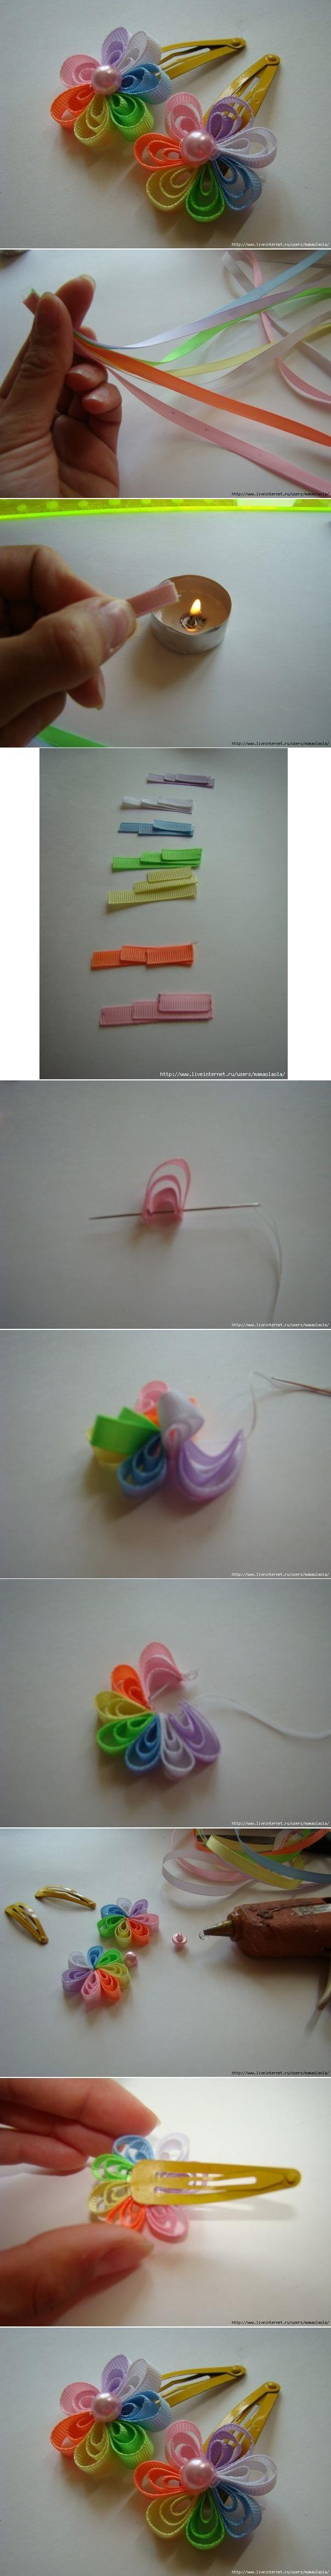 Ribbon hair clip. These are super cute.